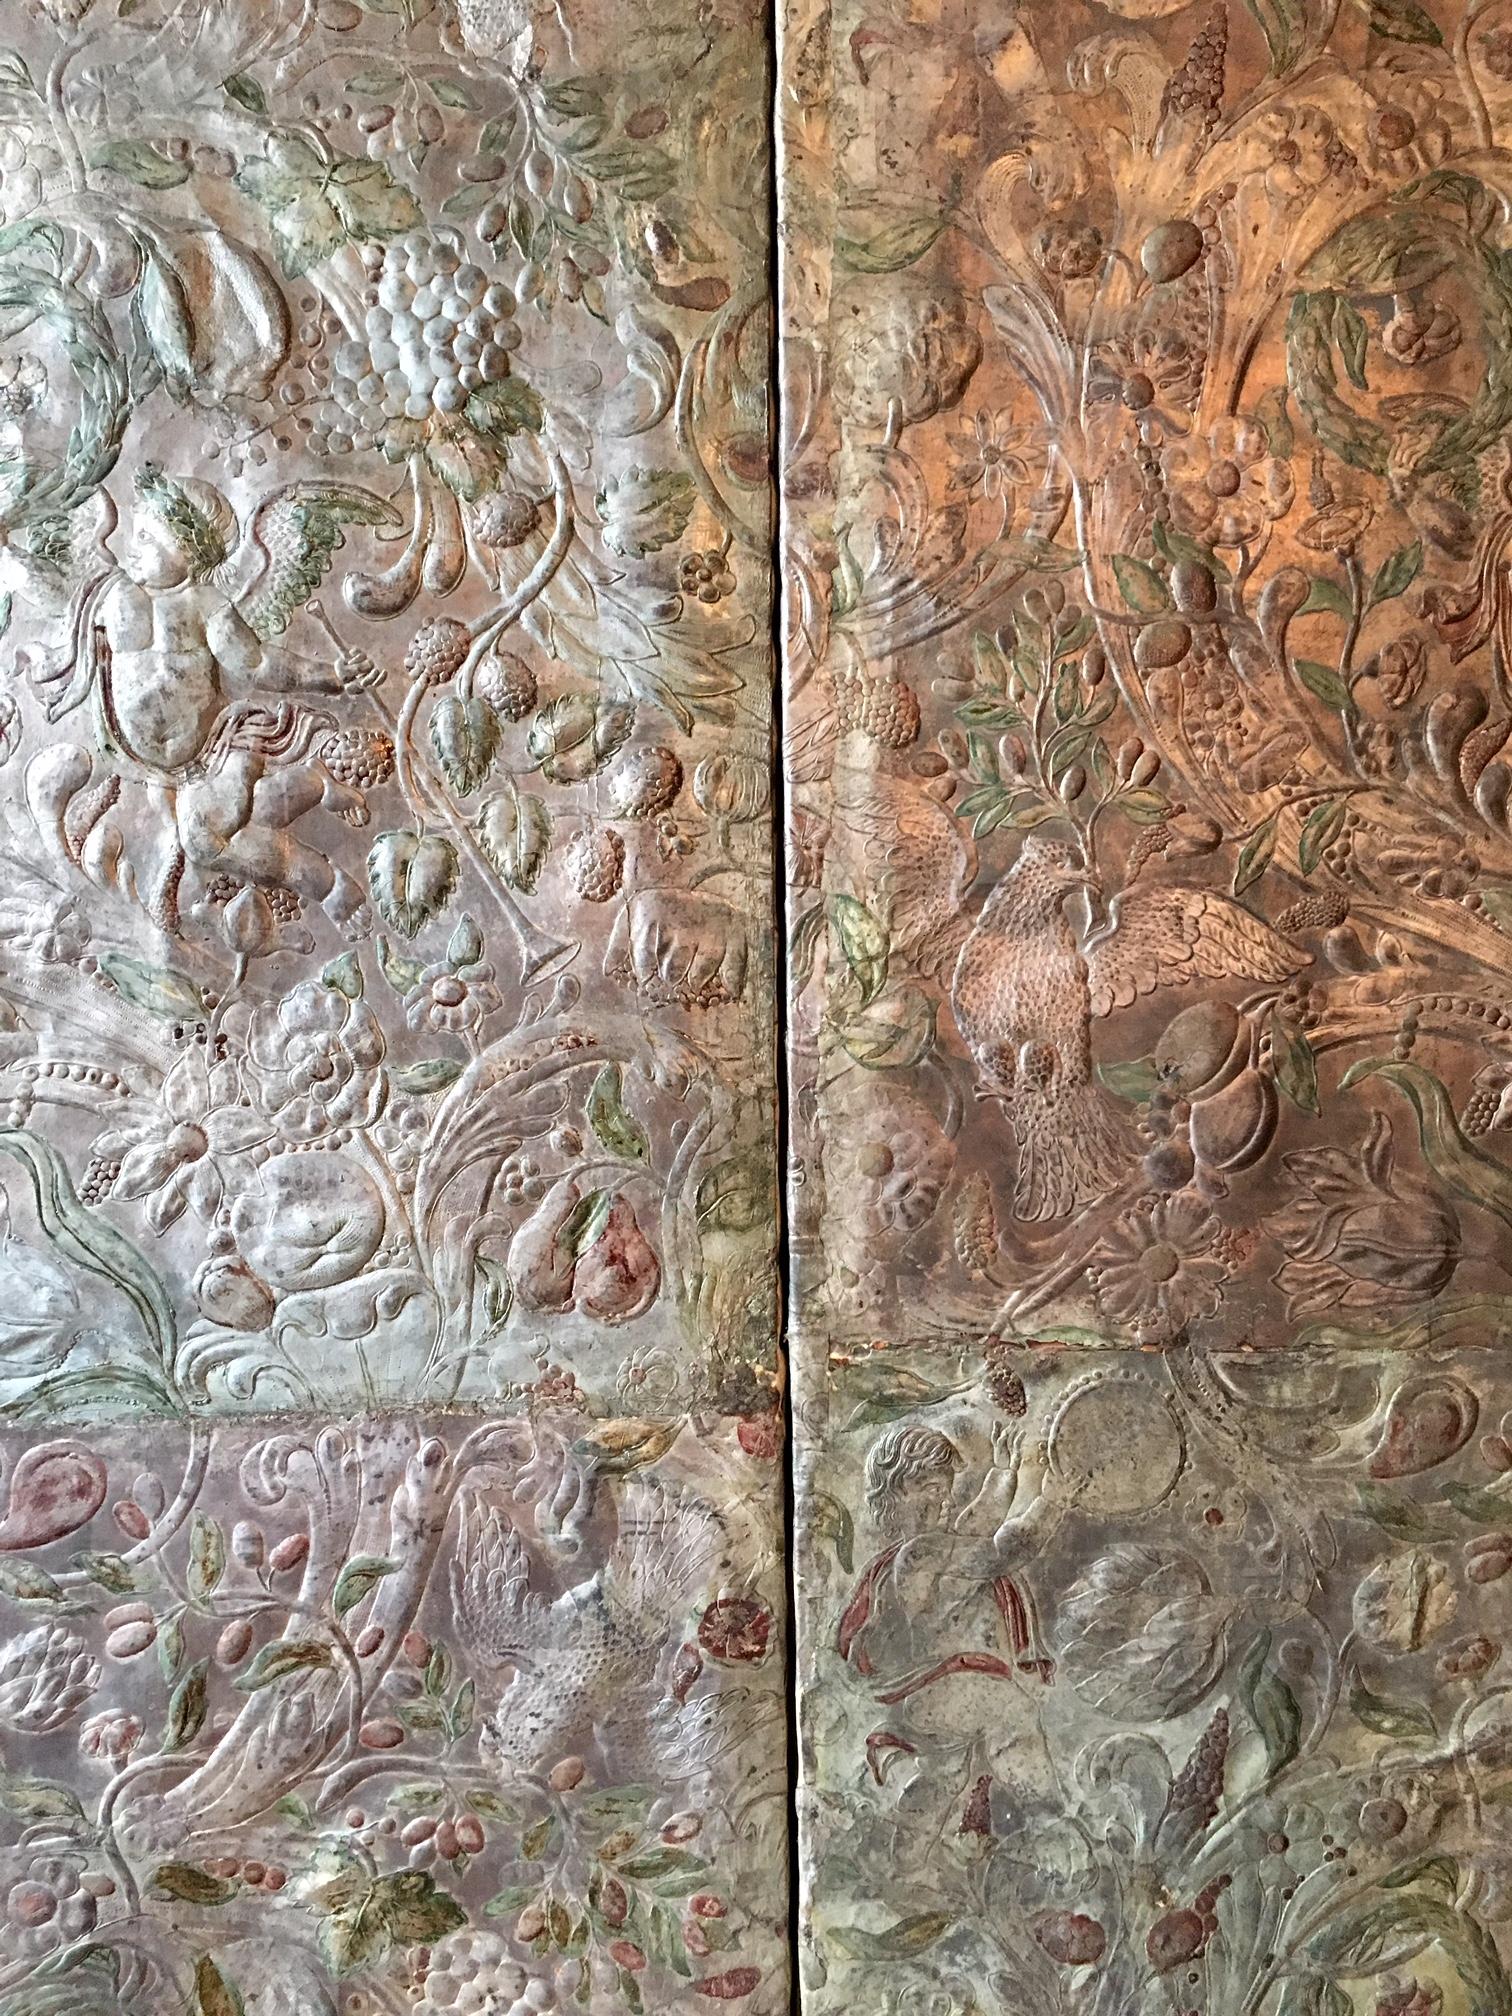 17th century tiles